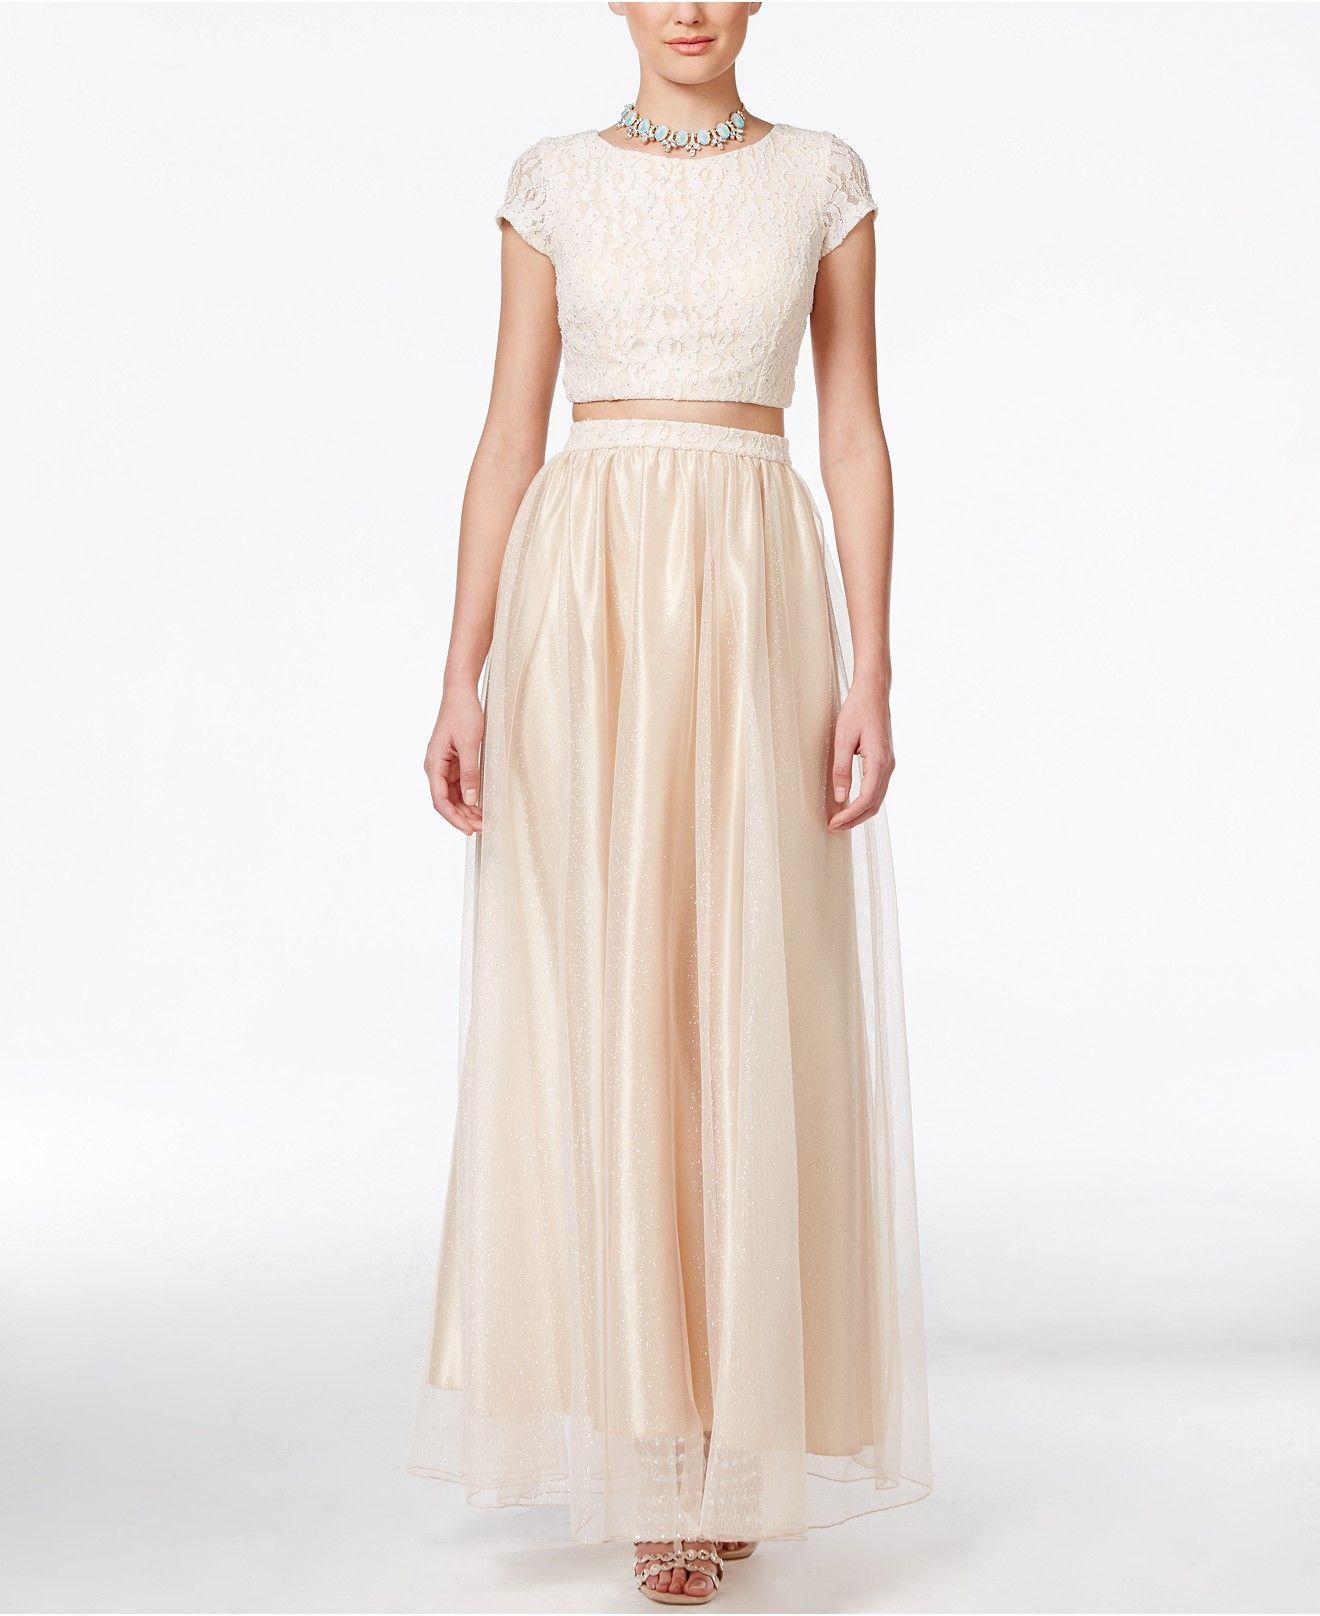 Speechless juniorsu lace twopiece gown juniors dresses macyus